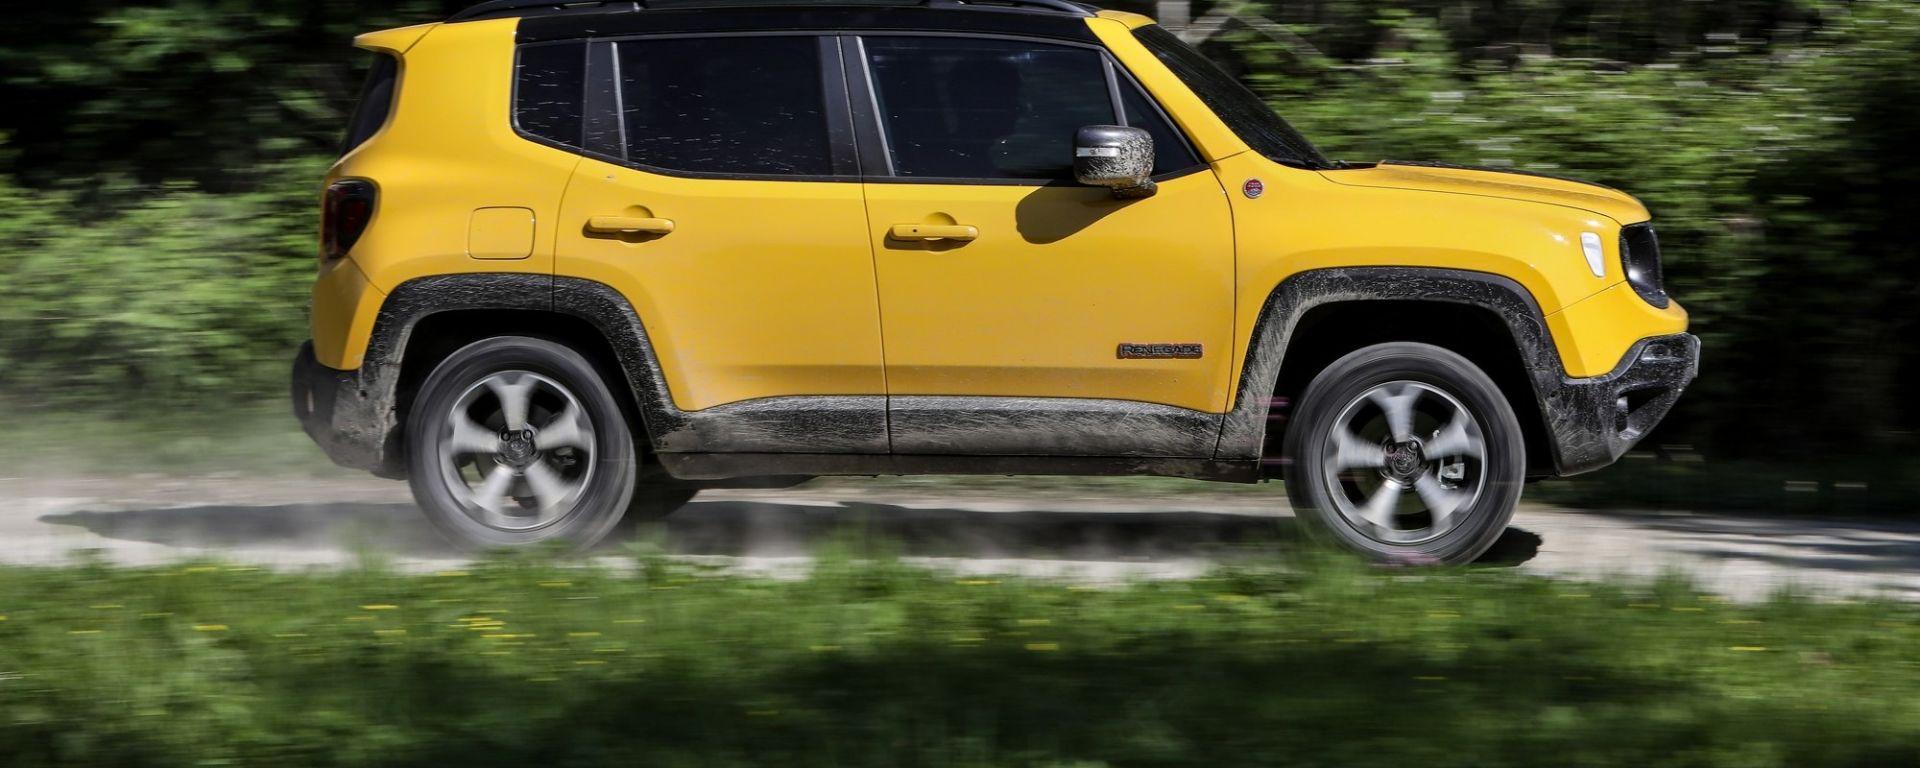 Jeep Renegade, in cantiere la versione plug-in hybrid